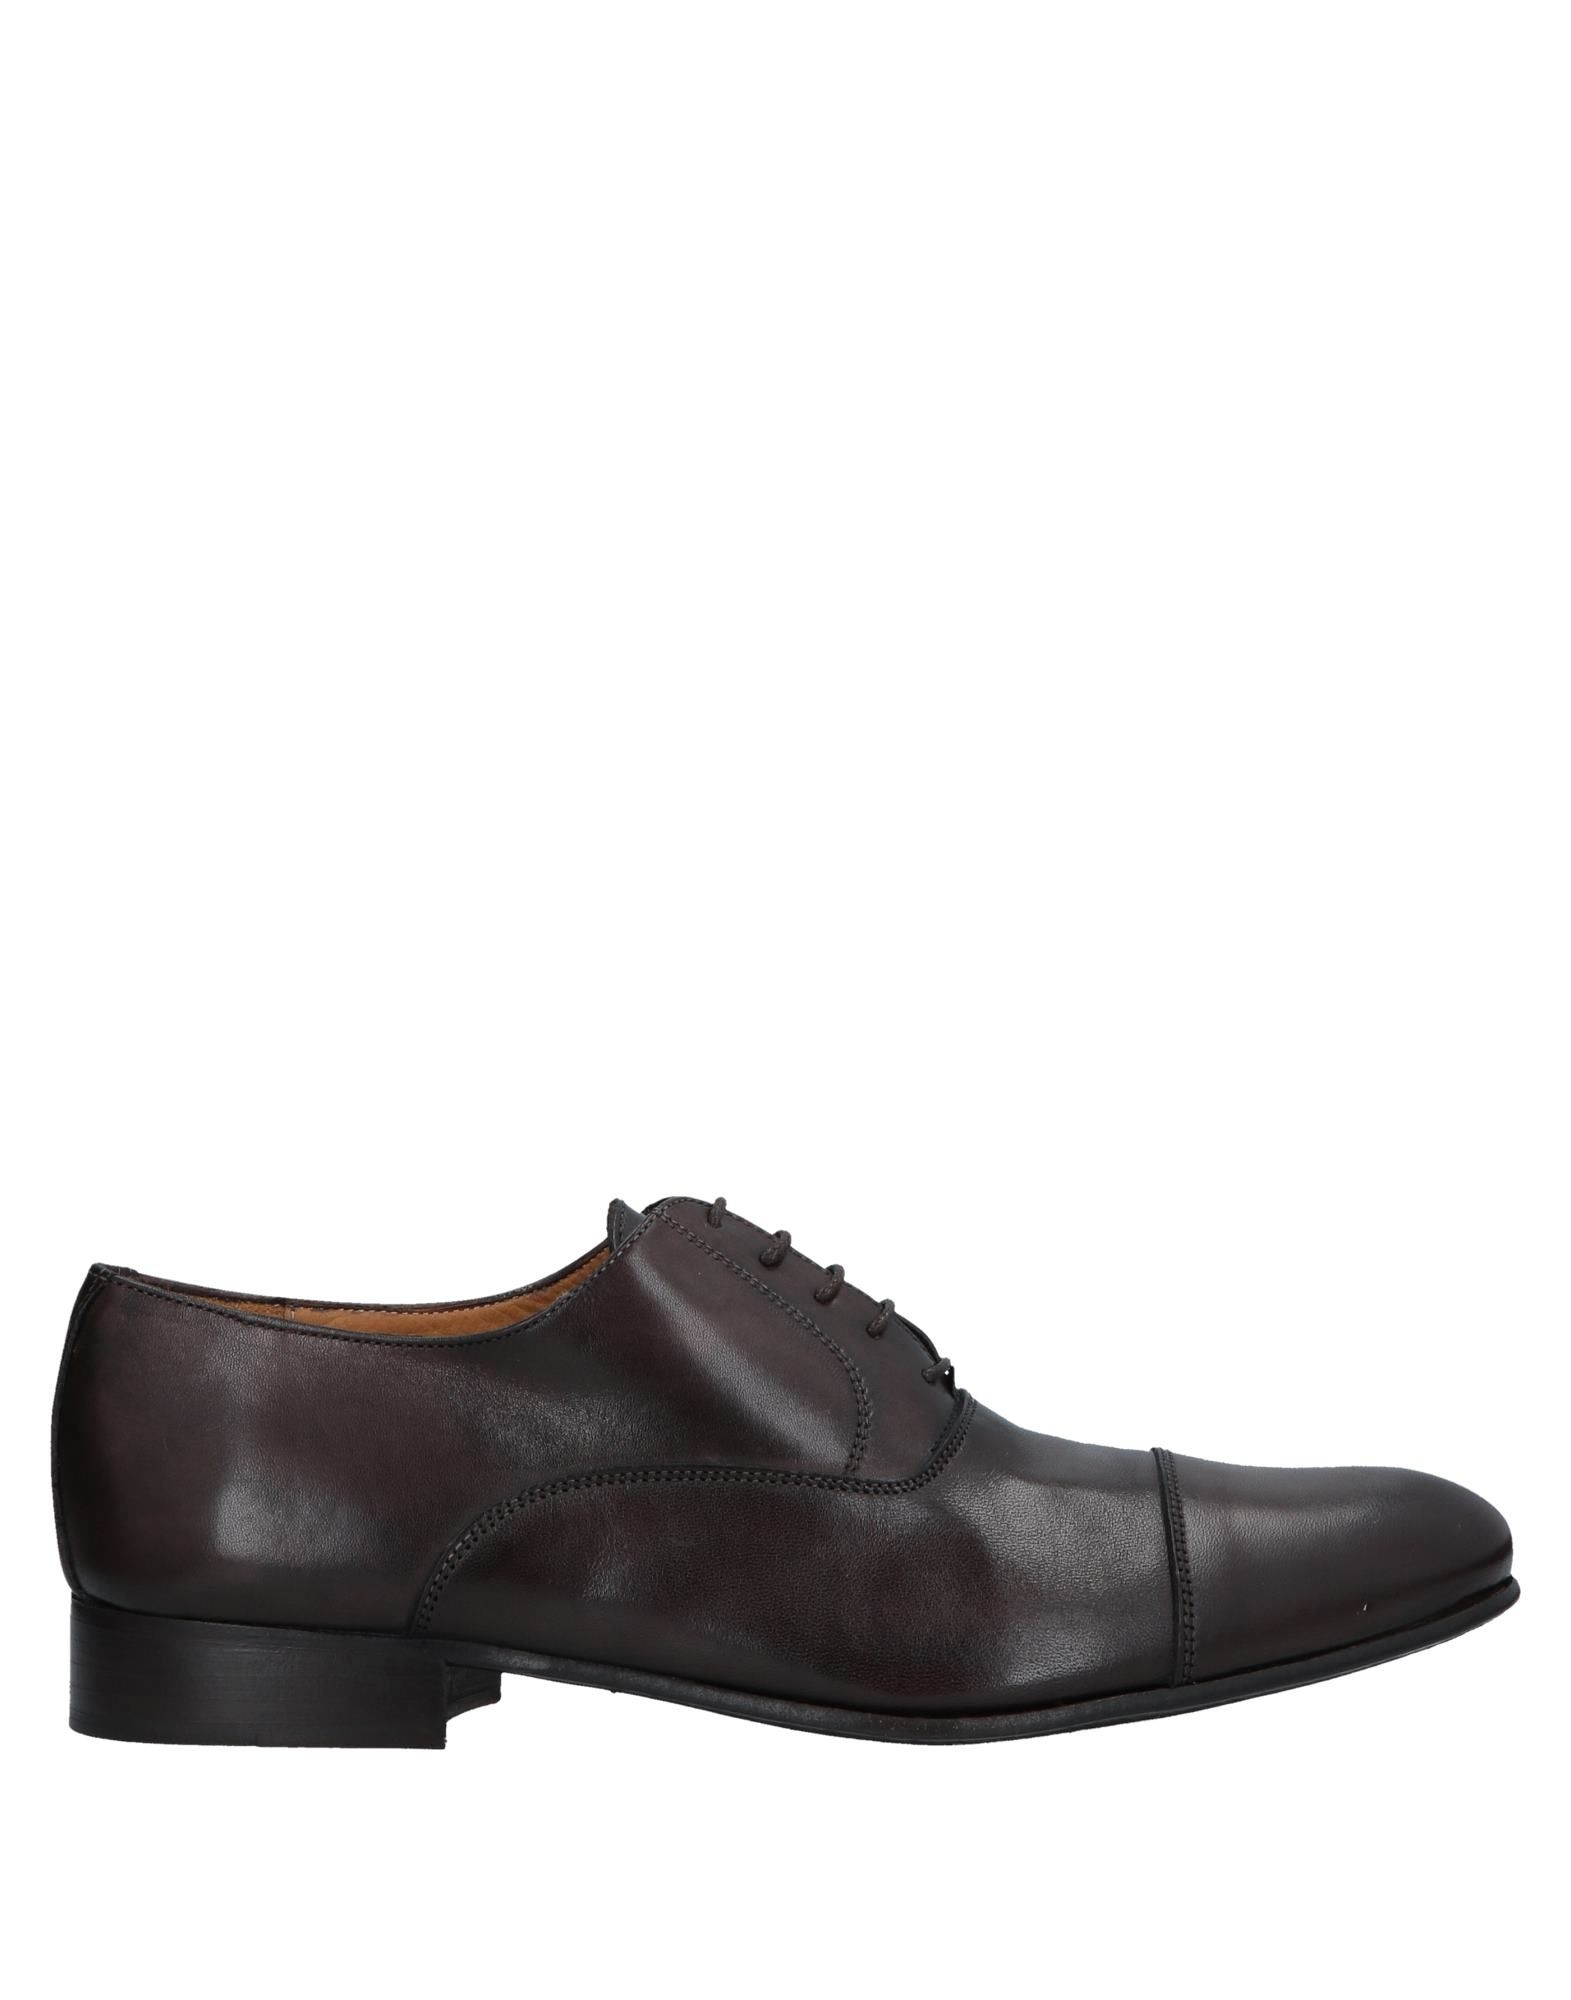 Фото - ANDERSON Обувь на шнурках обувь на высокой платформе dkny